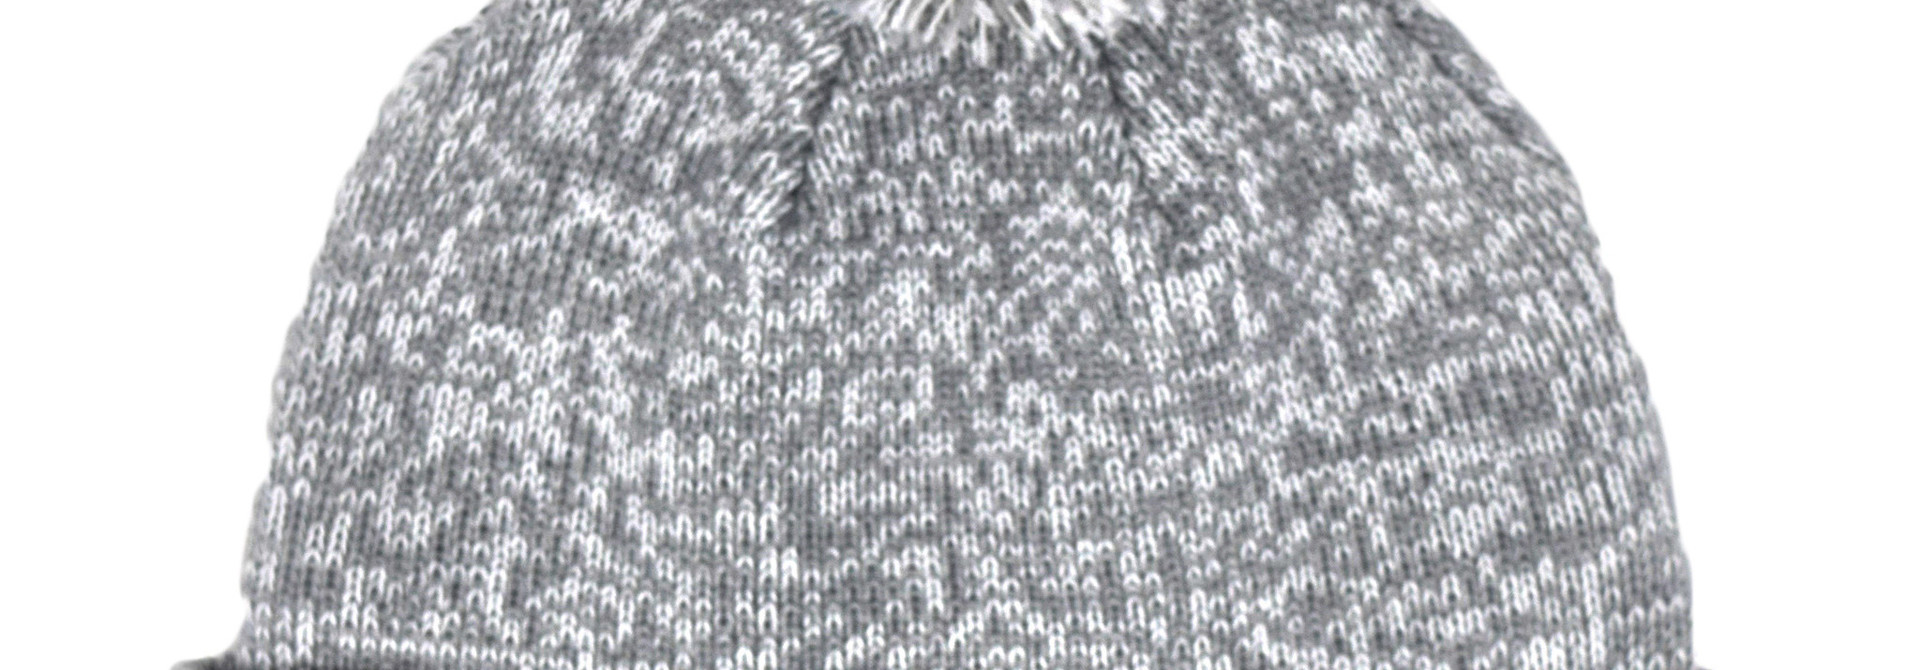 Gray Pom Pom Beanie with Leather BC tag